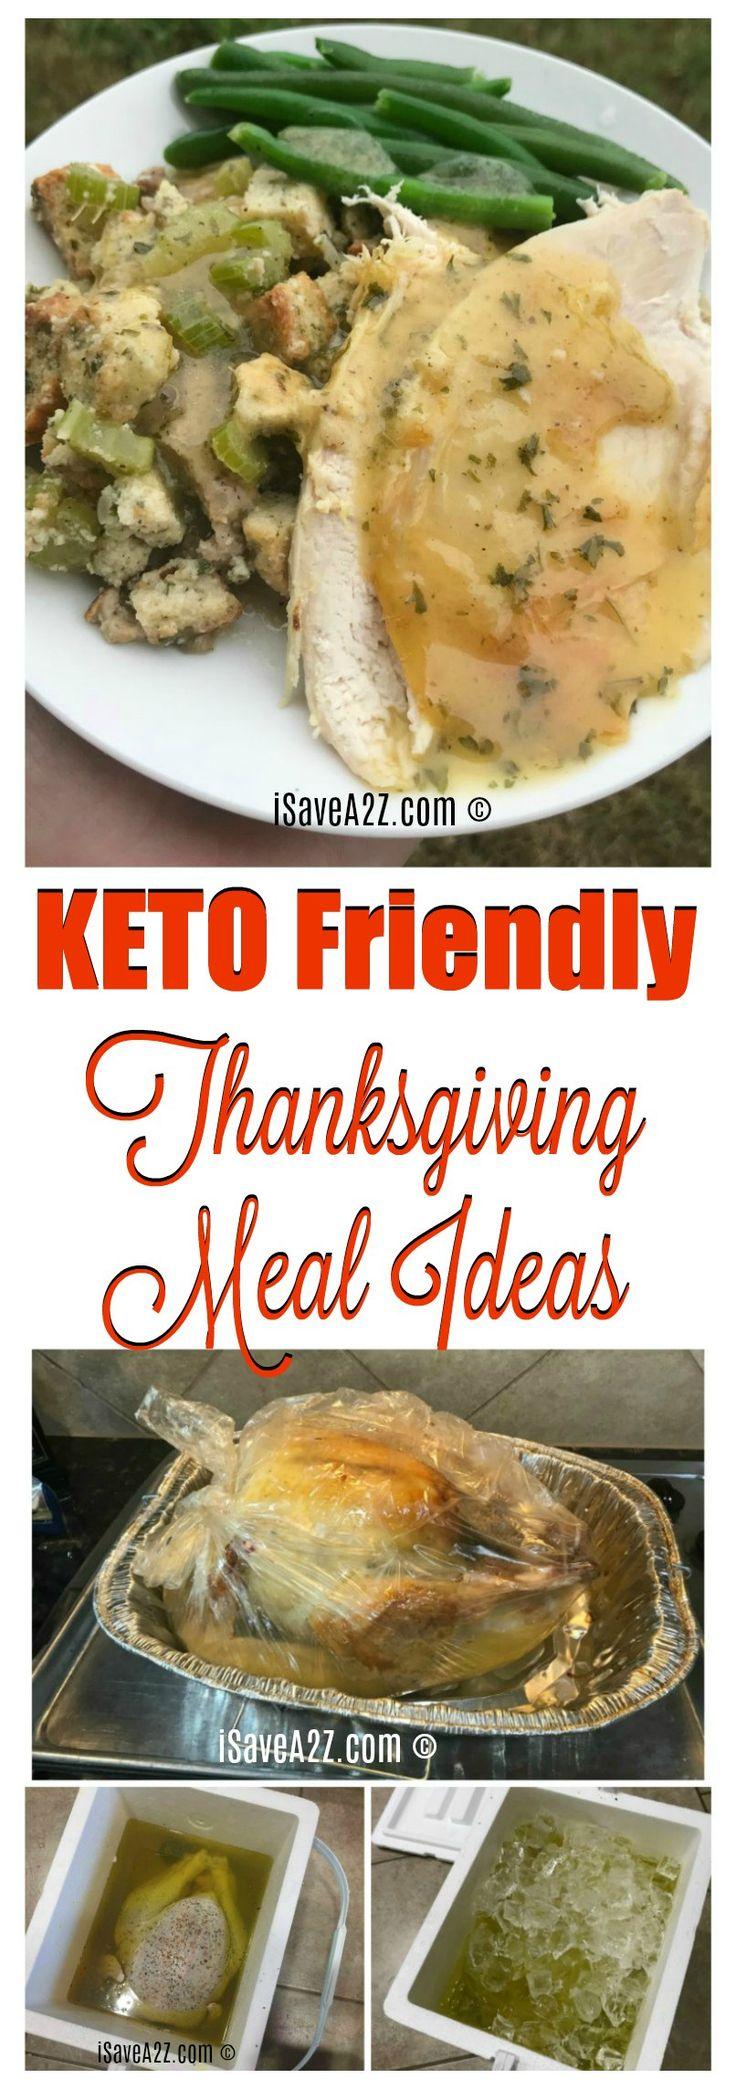 This Keto Turkey Gravy Recipe is the BEST!! via @isavea2z